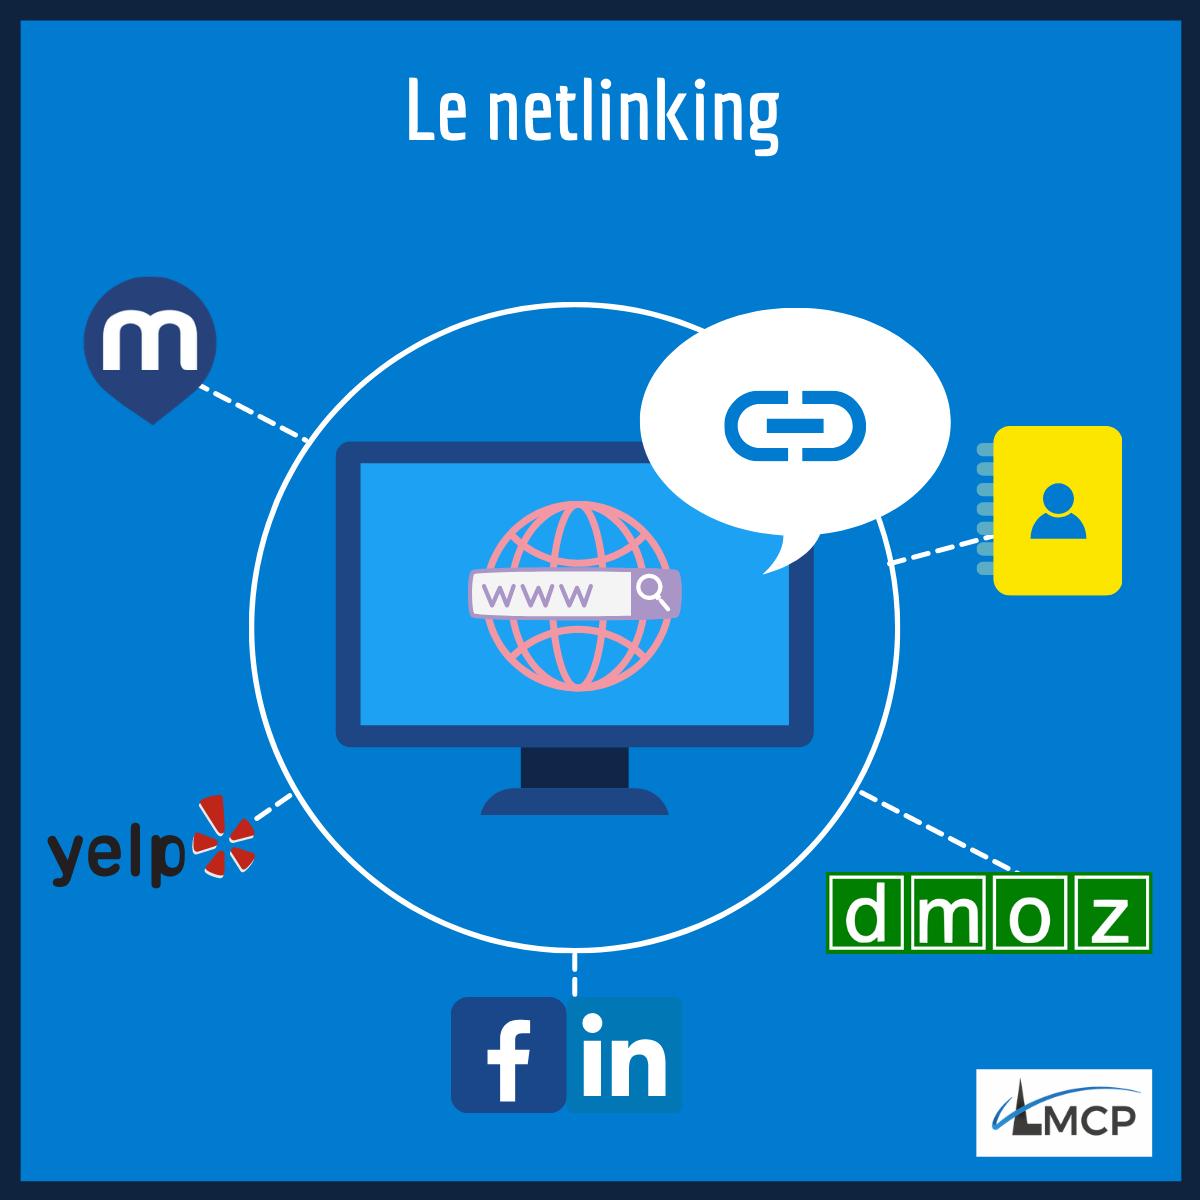 Netlinking LMCP